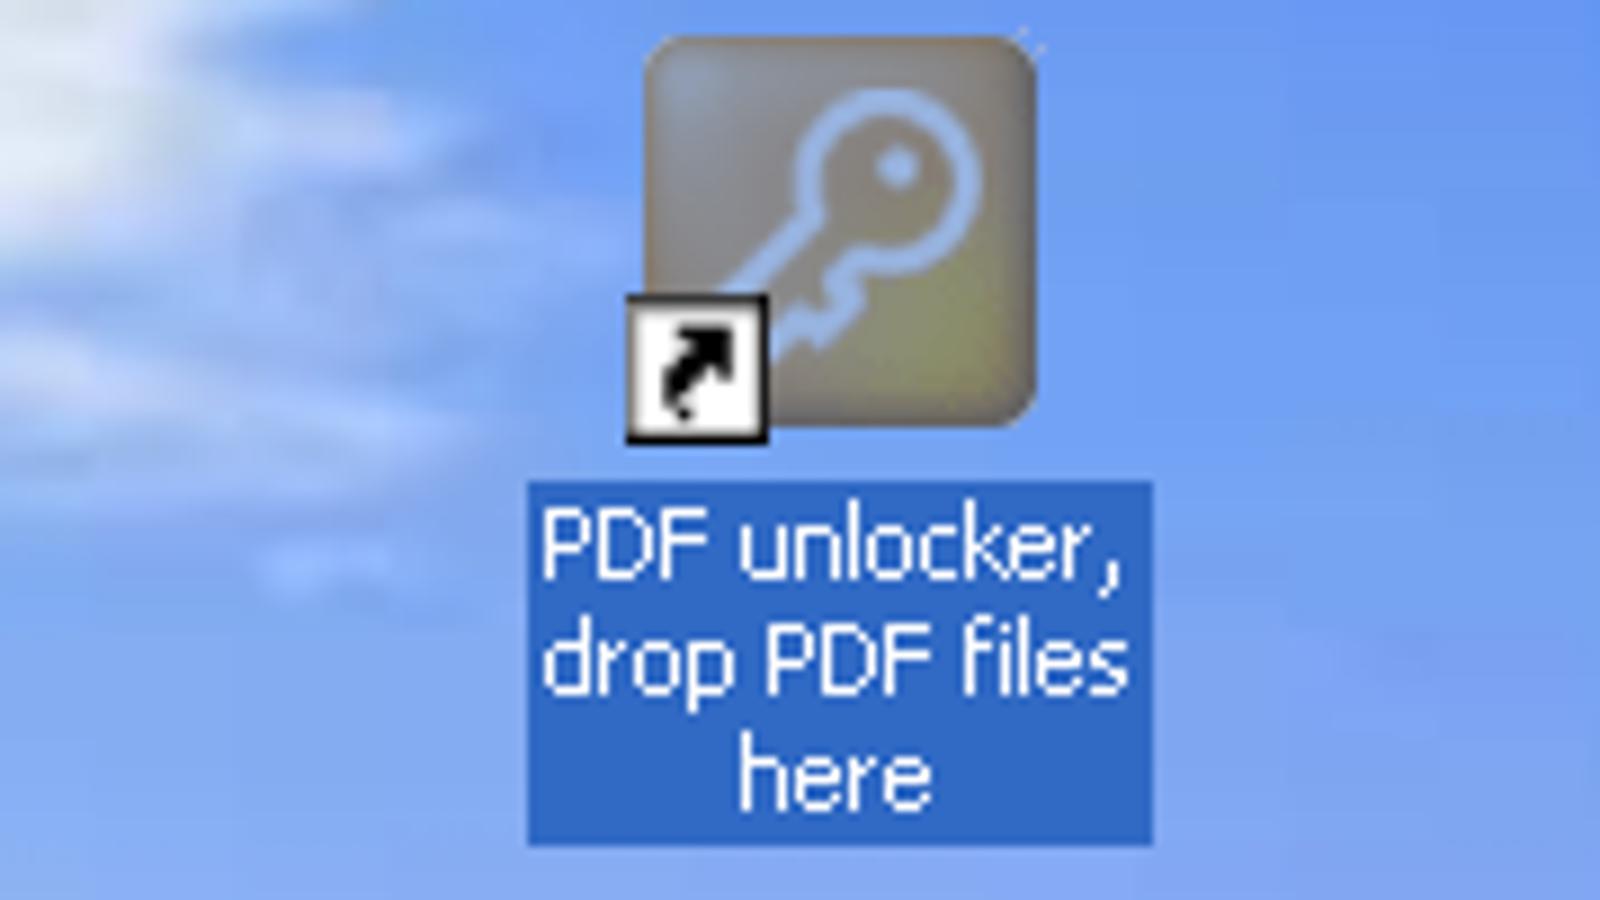 Freeware PDF Unlocker Enables Copy/Paste Functions Without Passwords